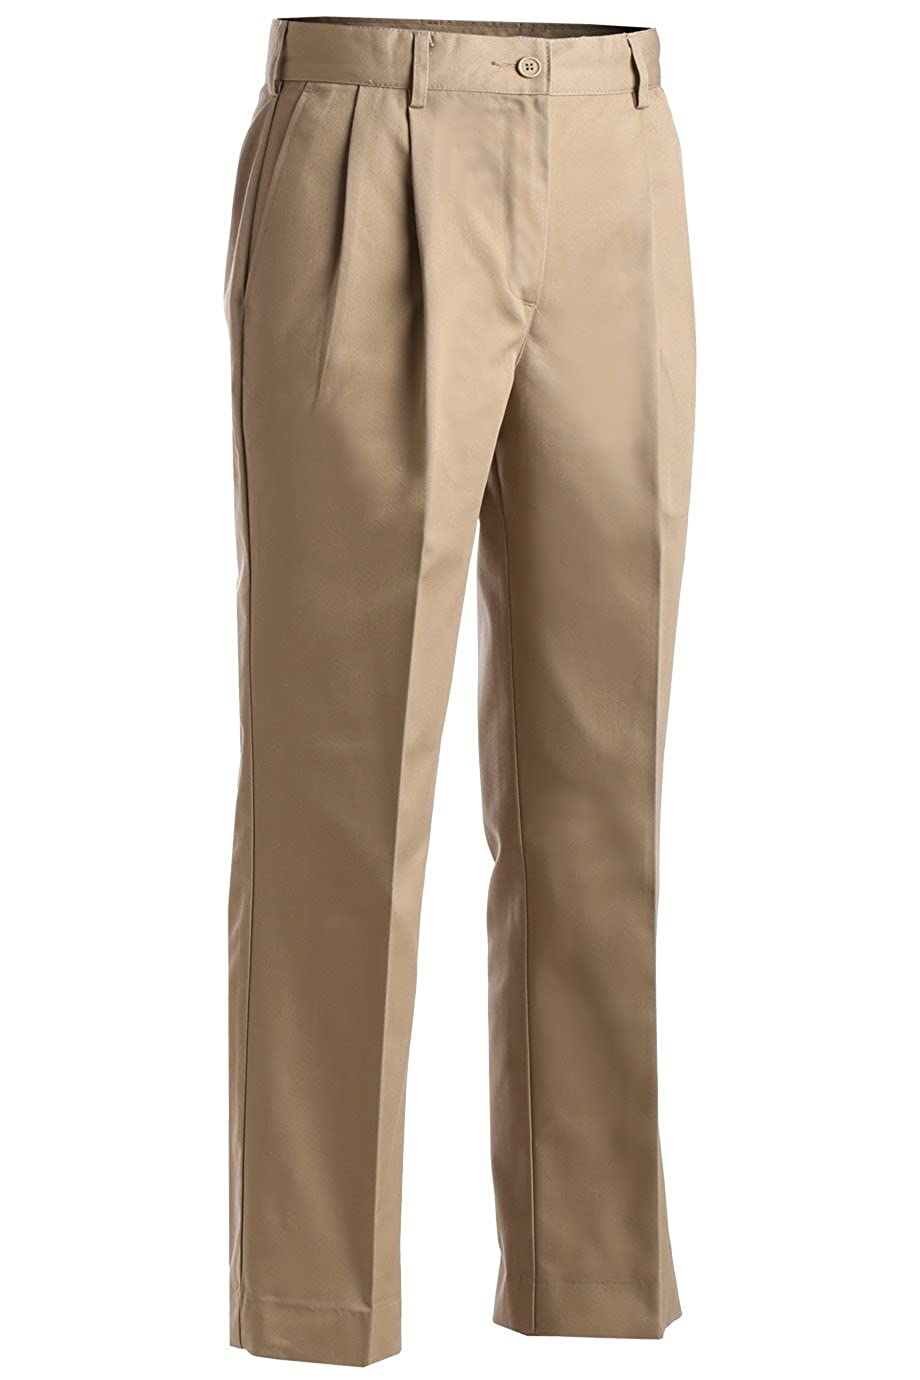 Edwards Garment Women's Utility Pleated Moisture Wicking Chino Pant 8667